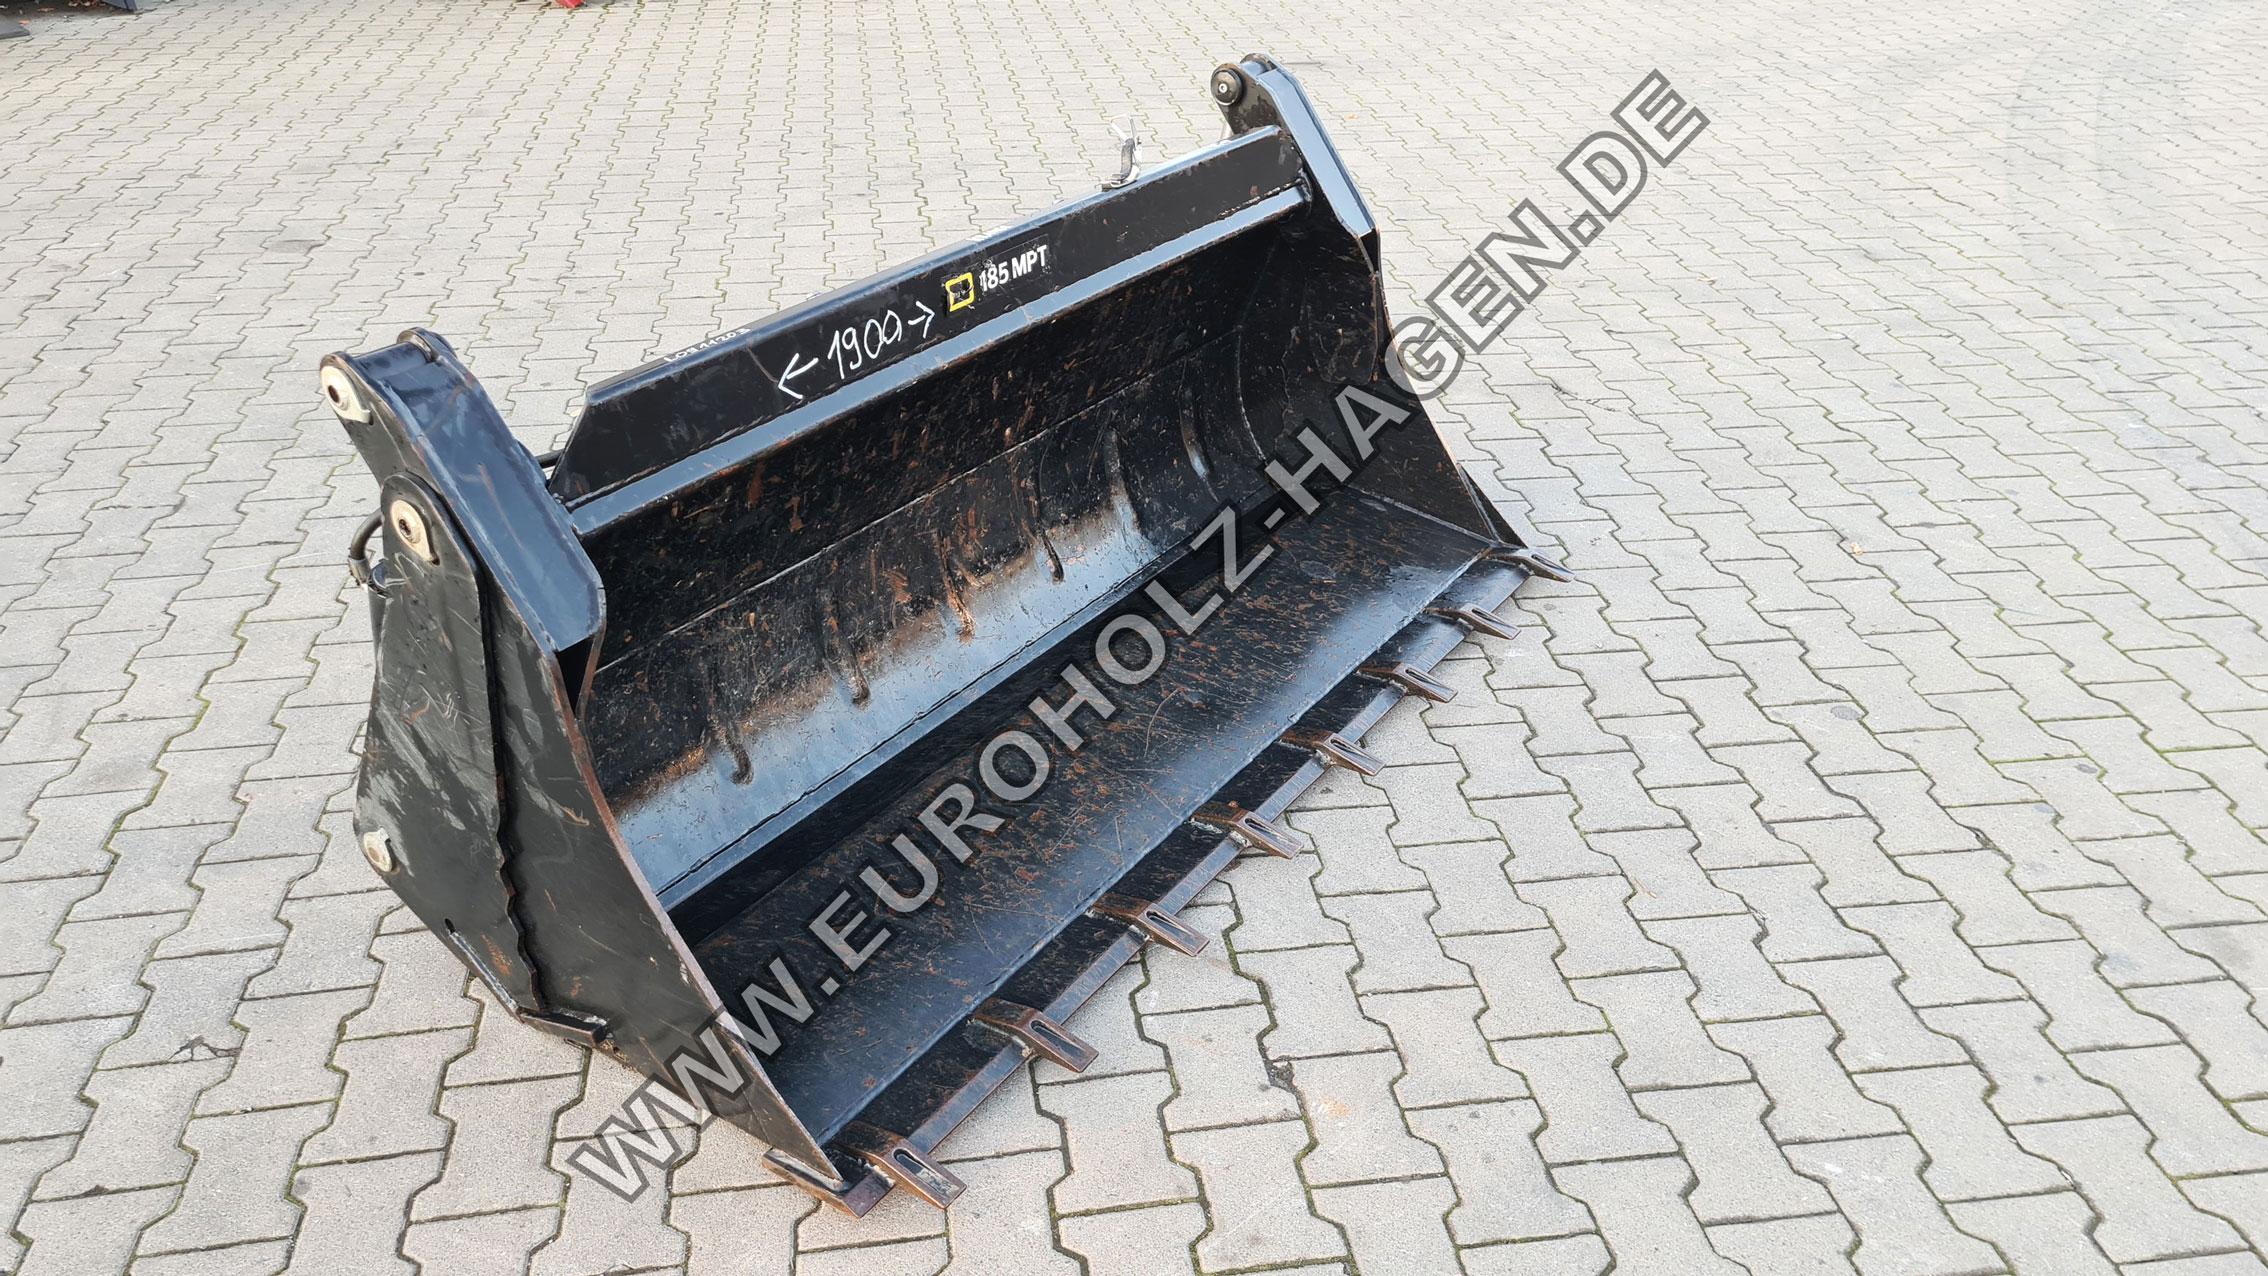 Klappschaufel hydraulisch hydraulische Frontschaufel Frontladerschaufel folding shovel Baggerschaufel Schaufel 1900 mm 190 cm